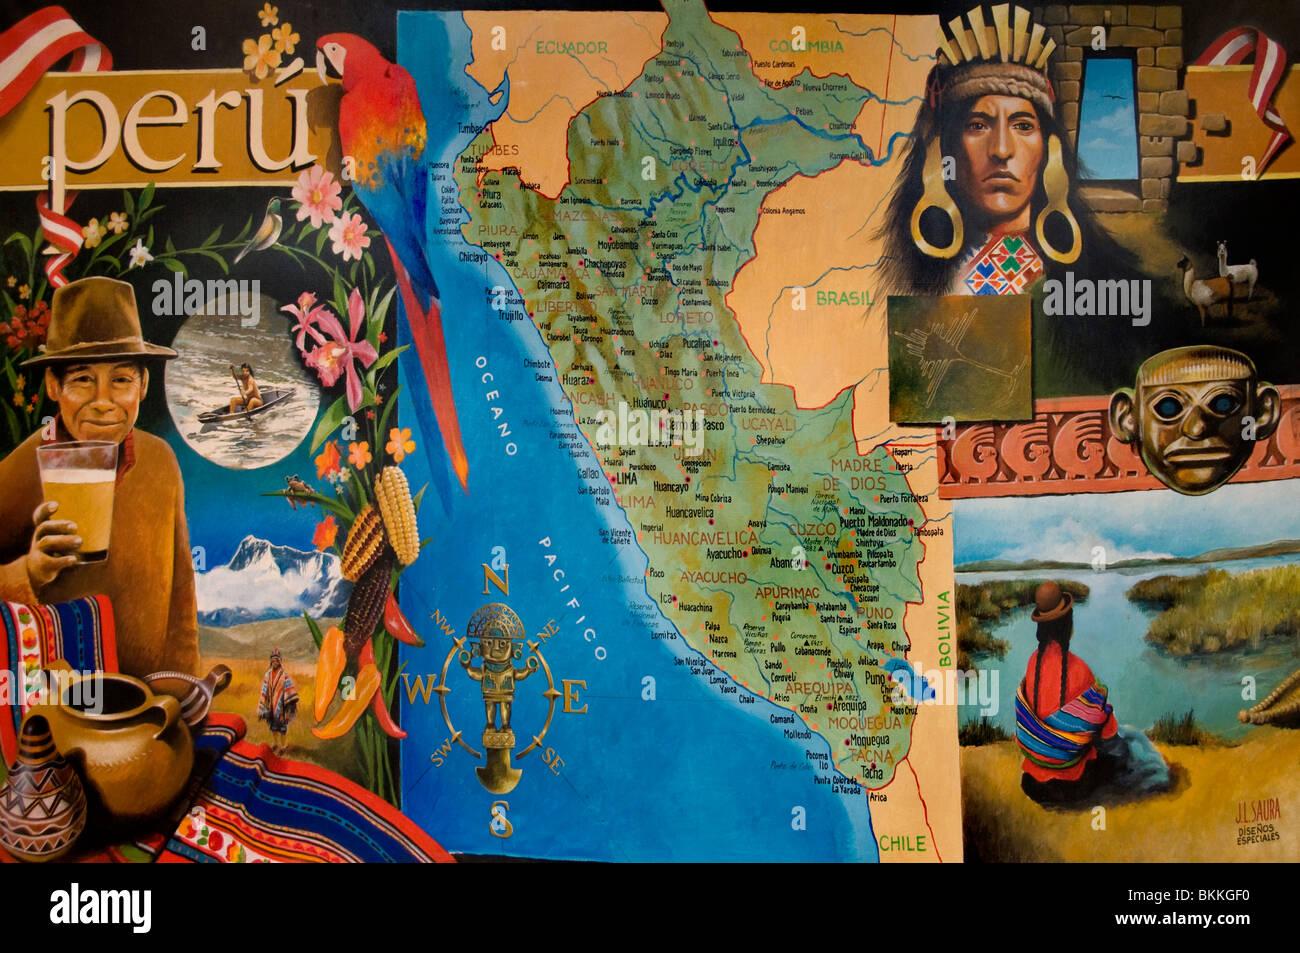 Peru Peruvian South America Indian Painting Map - Stock Image